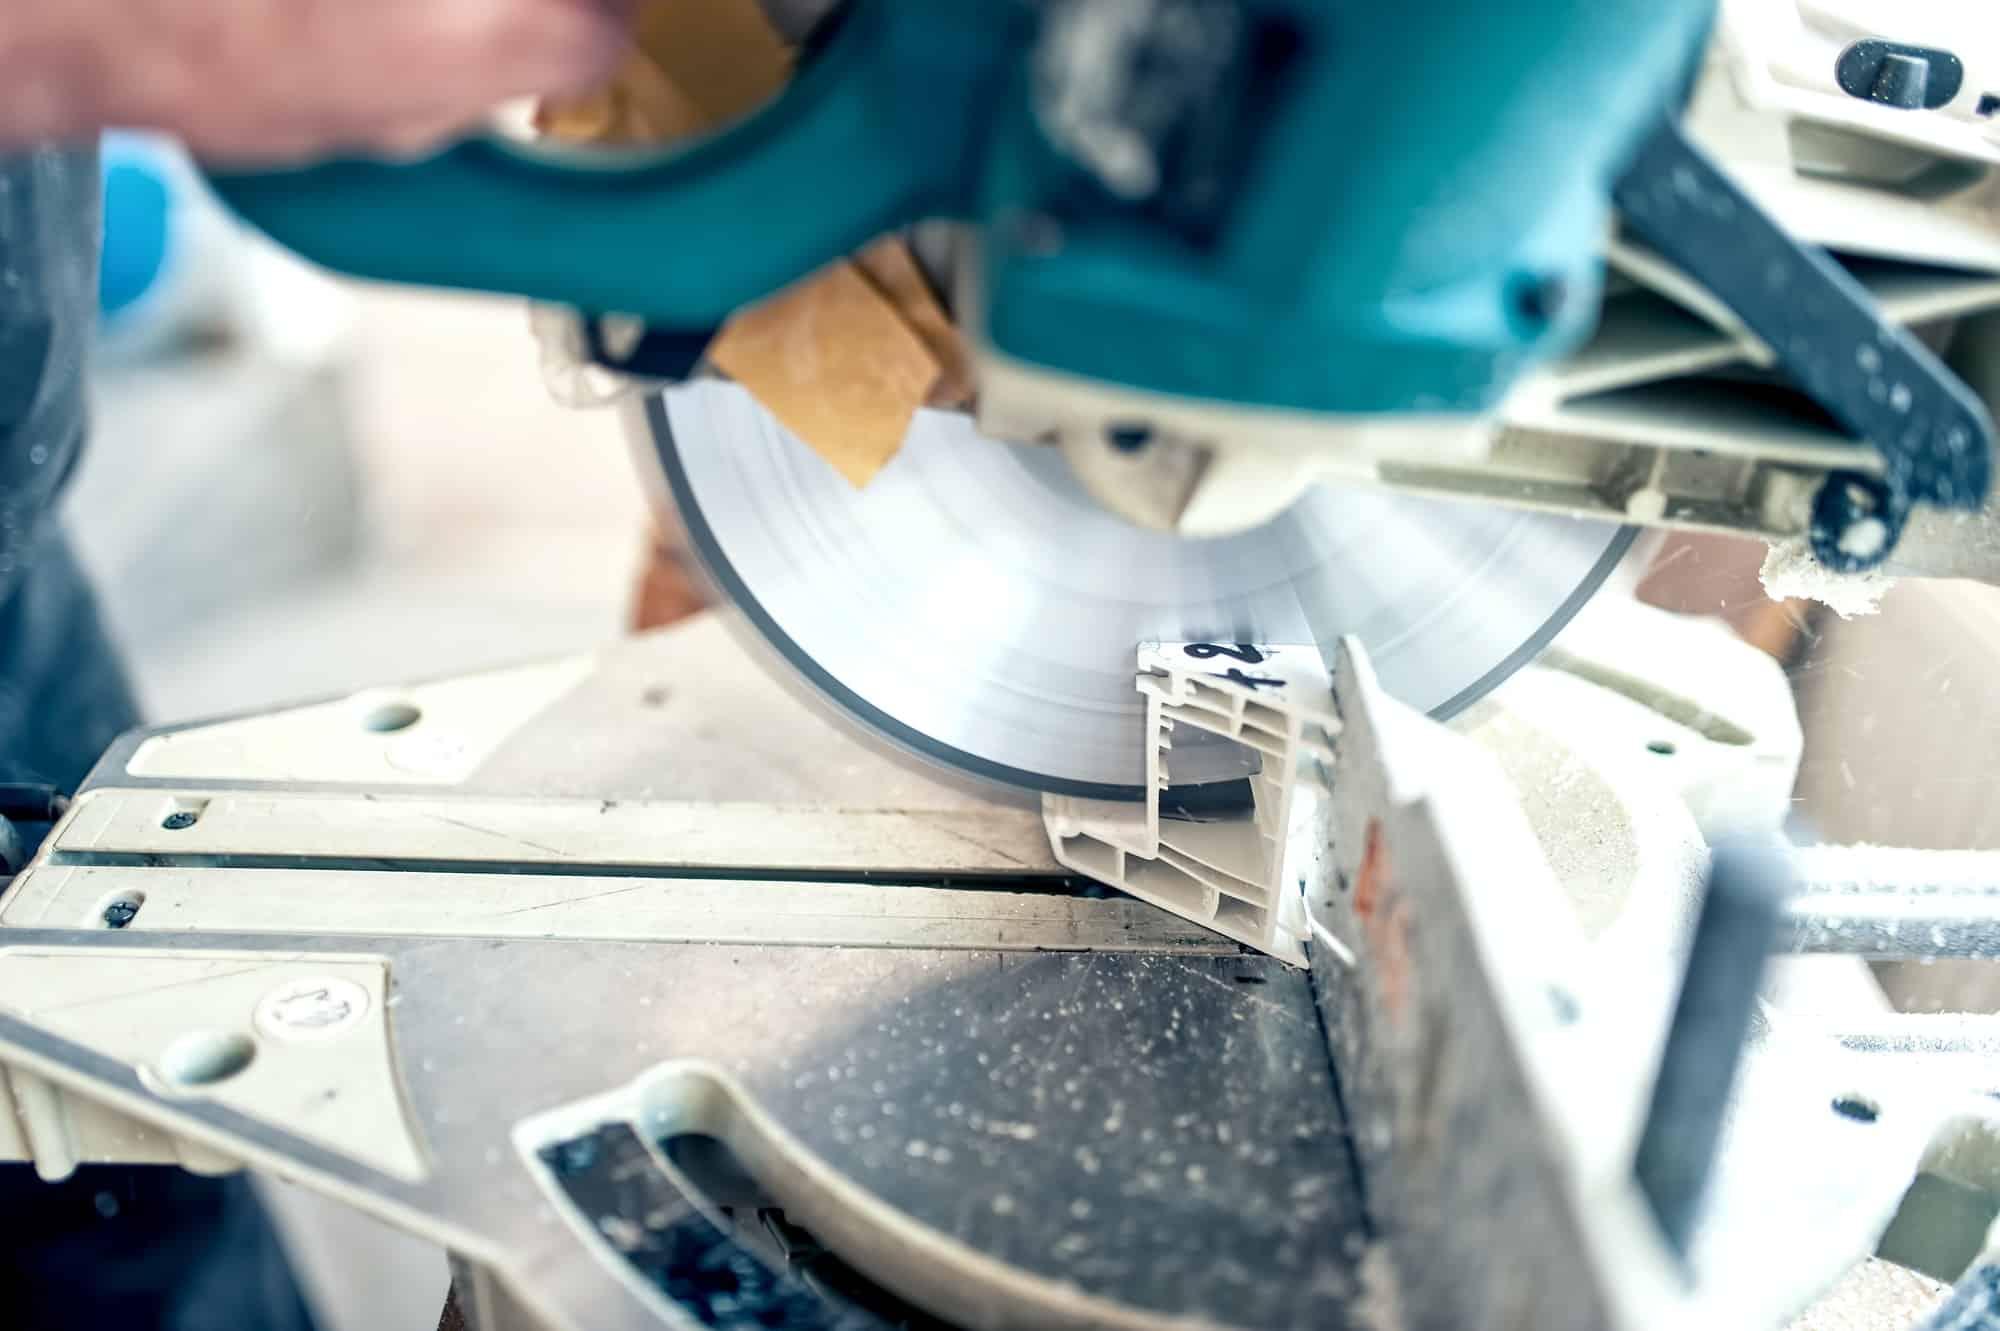 worker or handyman cutting PVC profile with circular saw, sliding saw